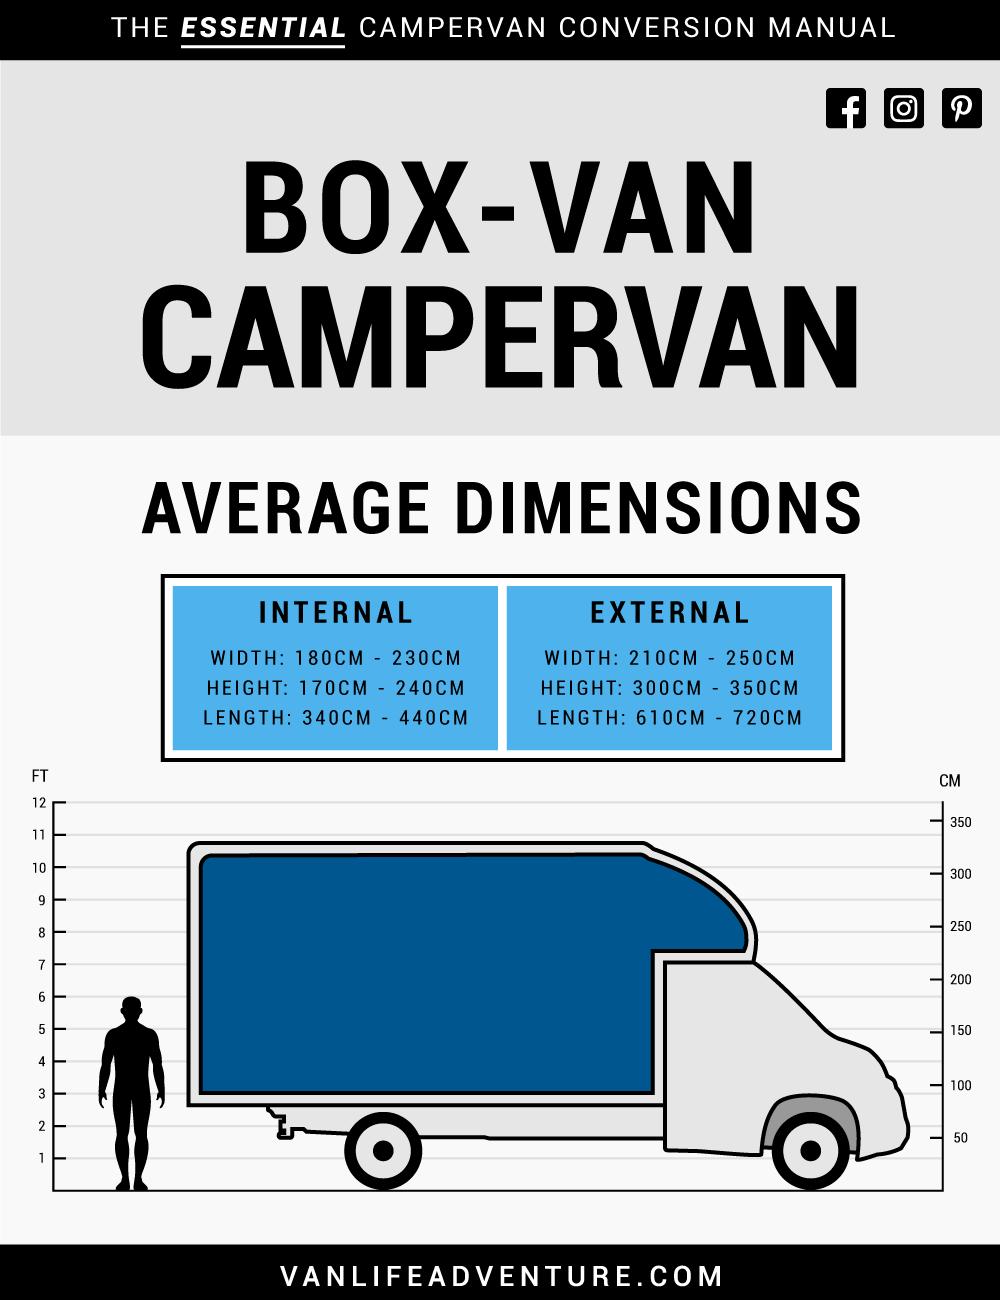 Campervan Sizes Box-Van Campervan Dimensions VW Renault Mercedes Ford Dodge Promaster